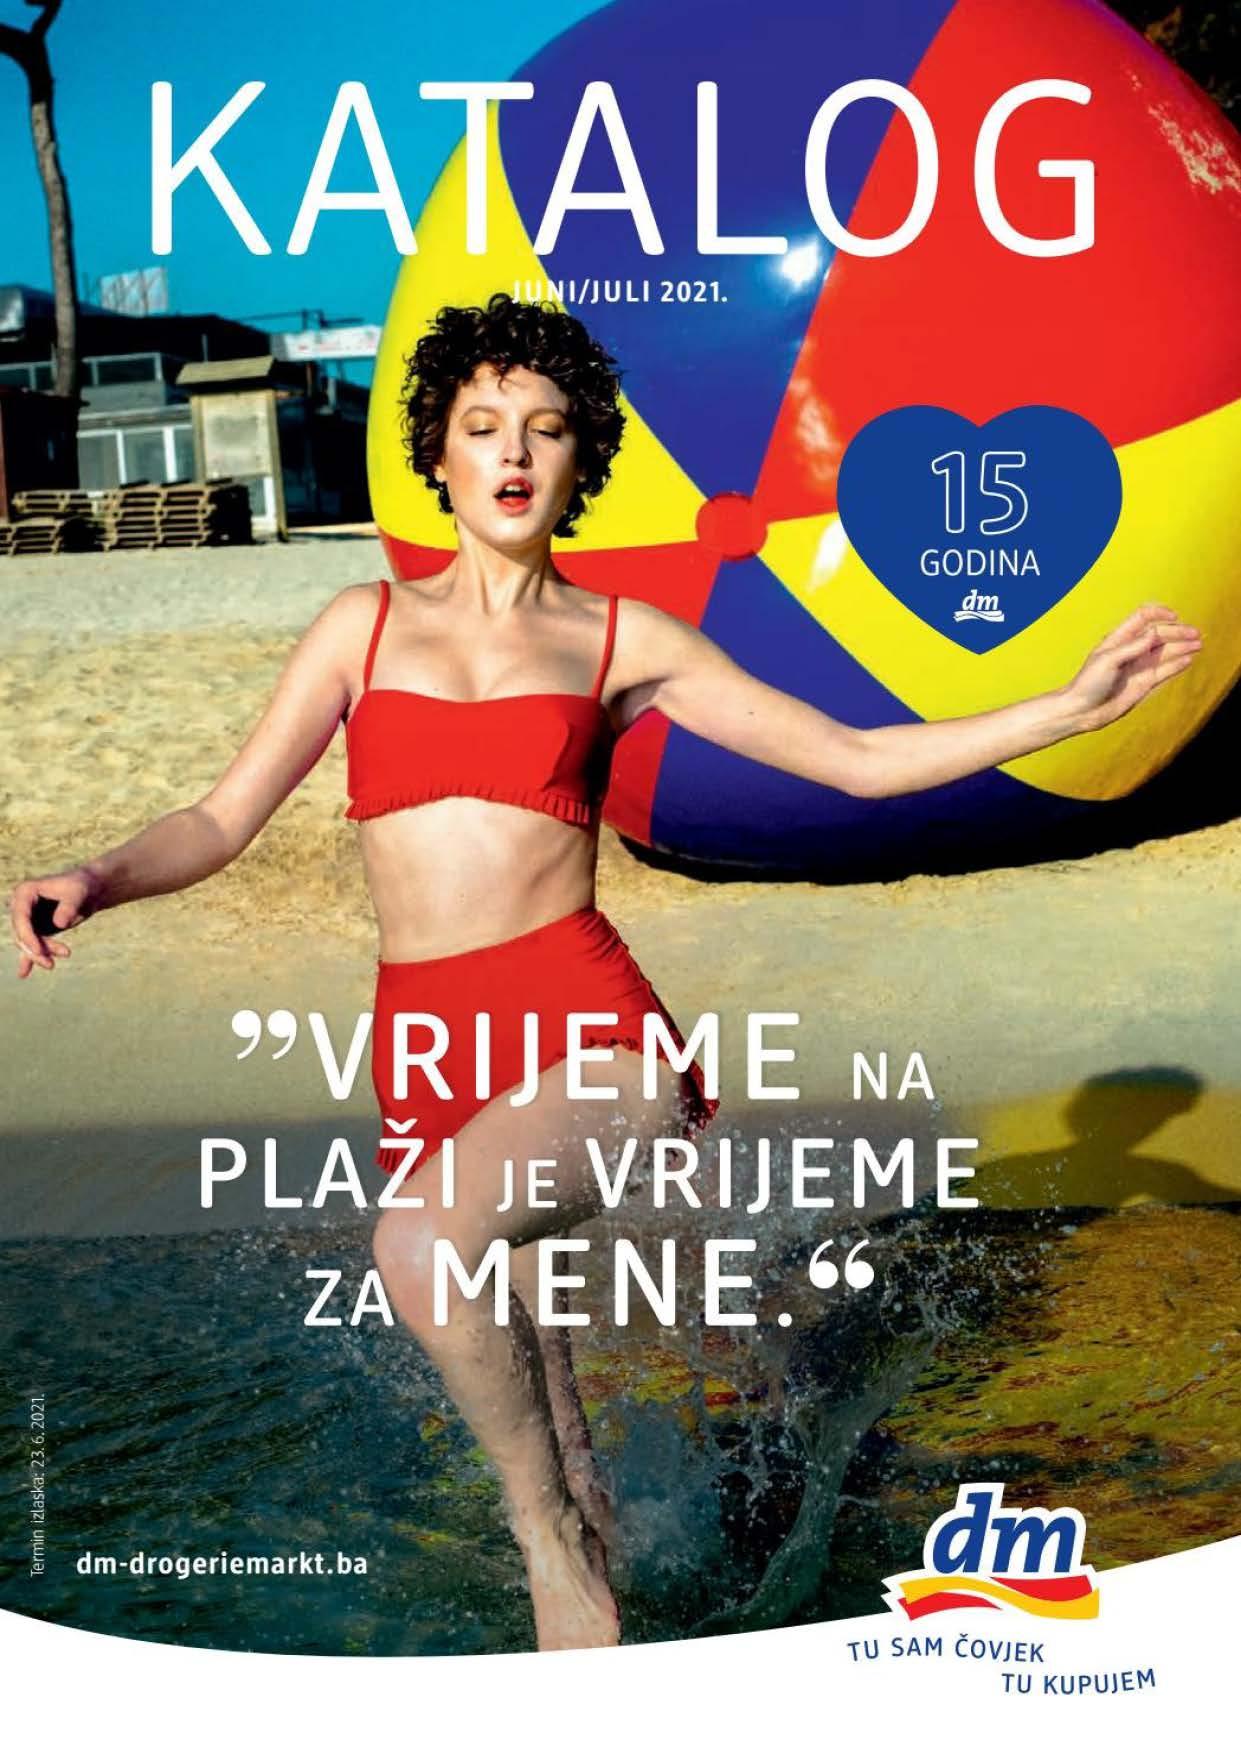 DM Katalog BiH JUN JUL 2021 23.6.2021. 6.7.2021. eKatalozi.com PR Page 01 1